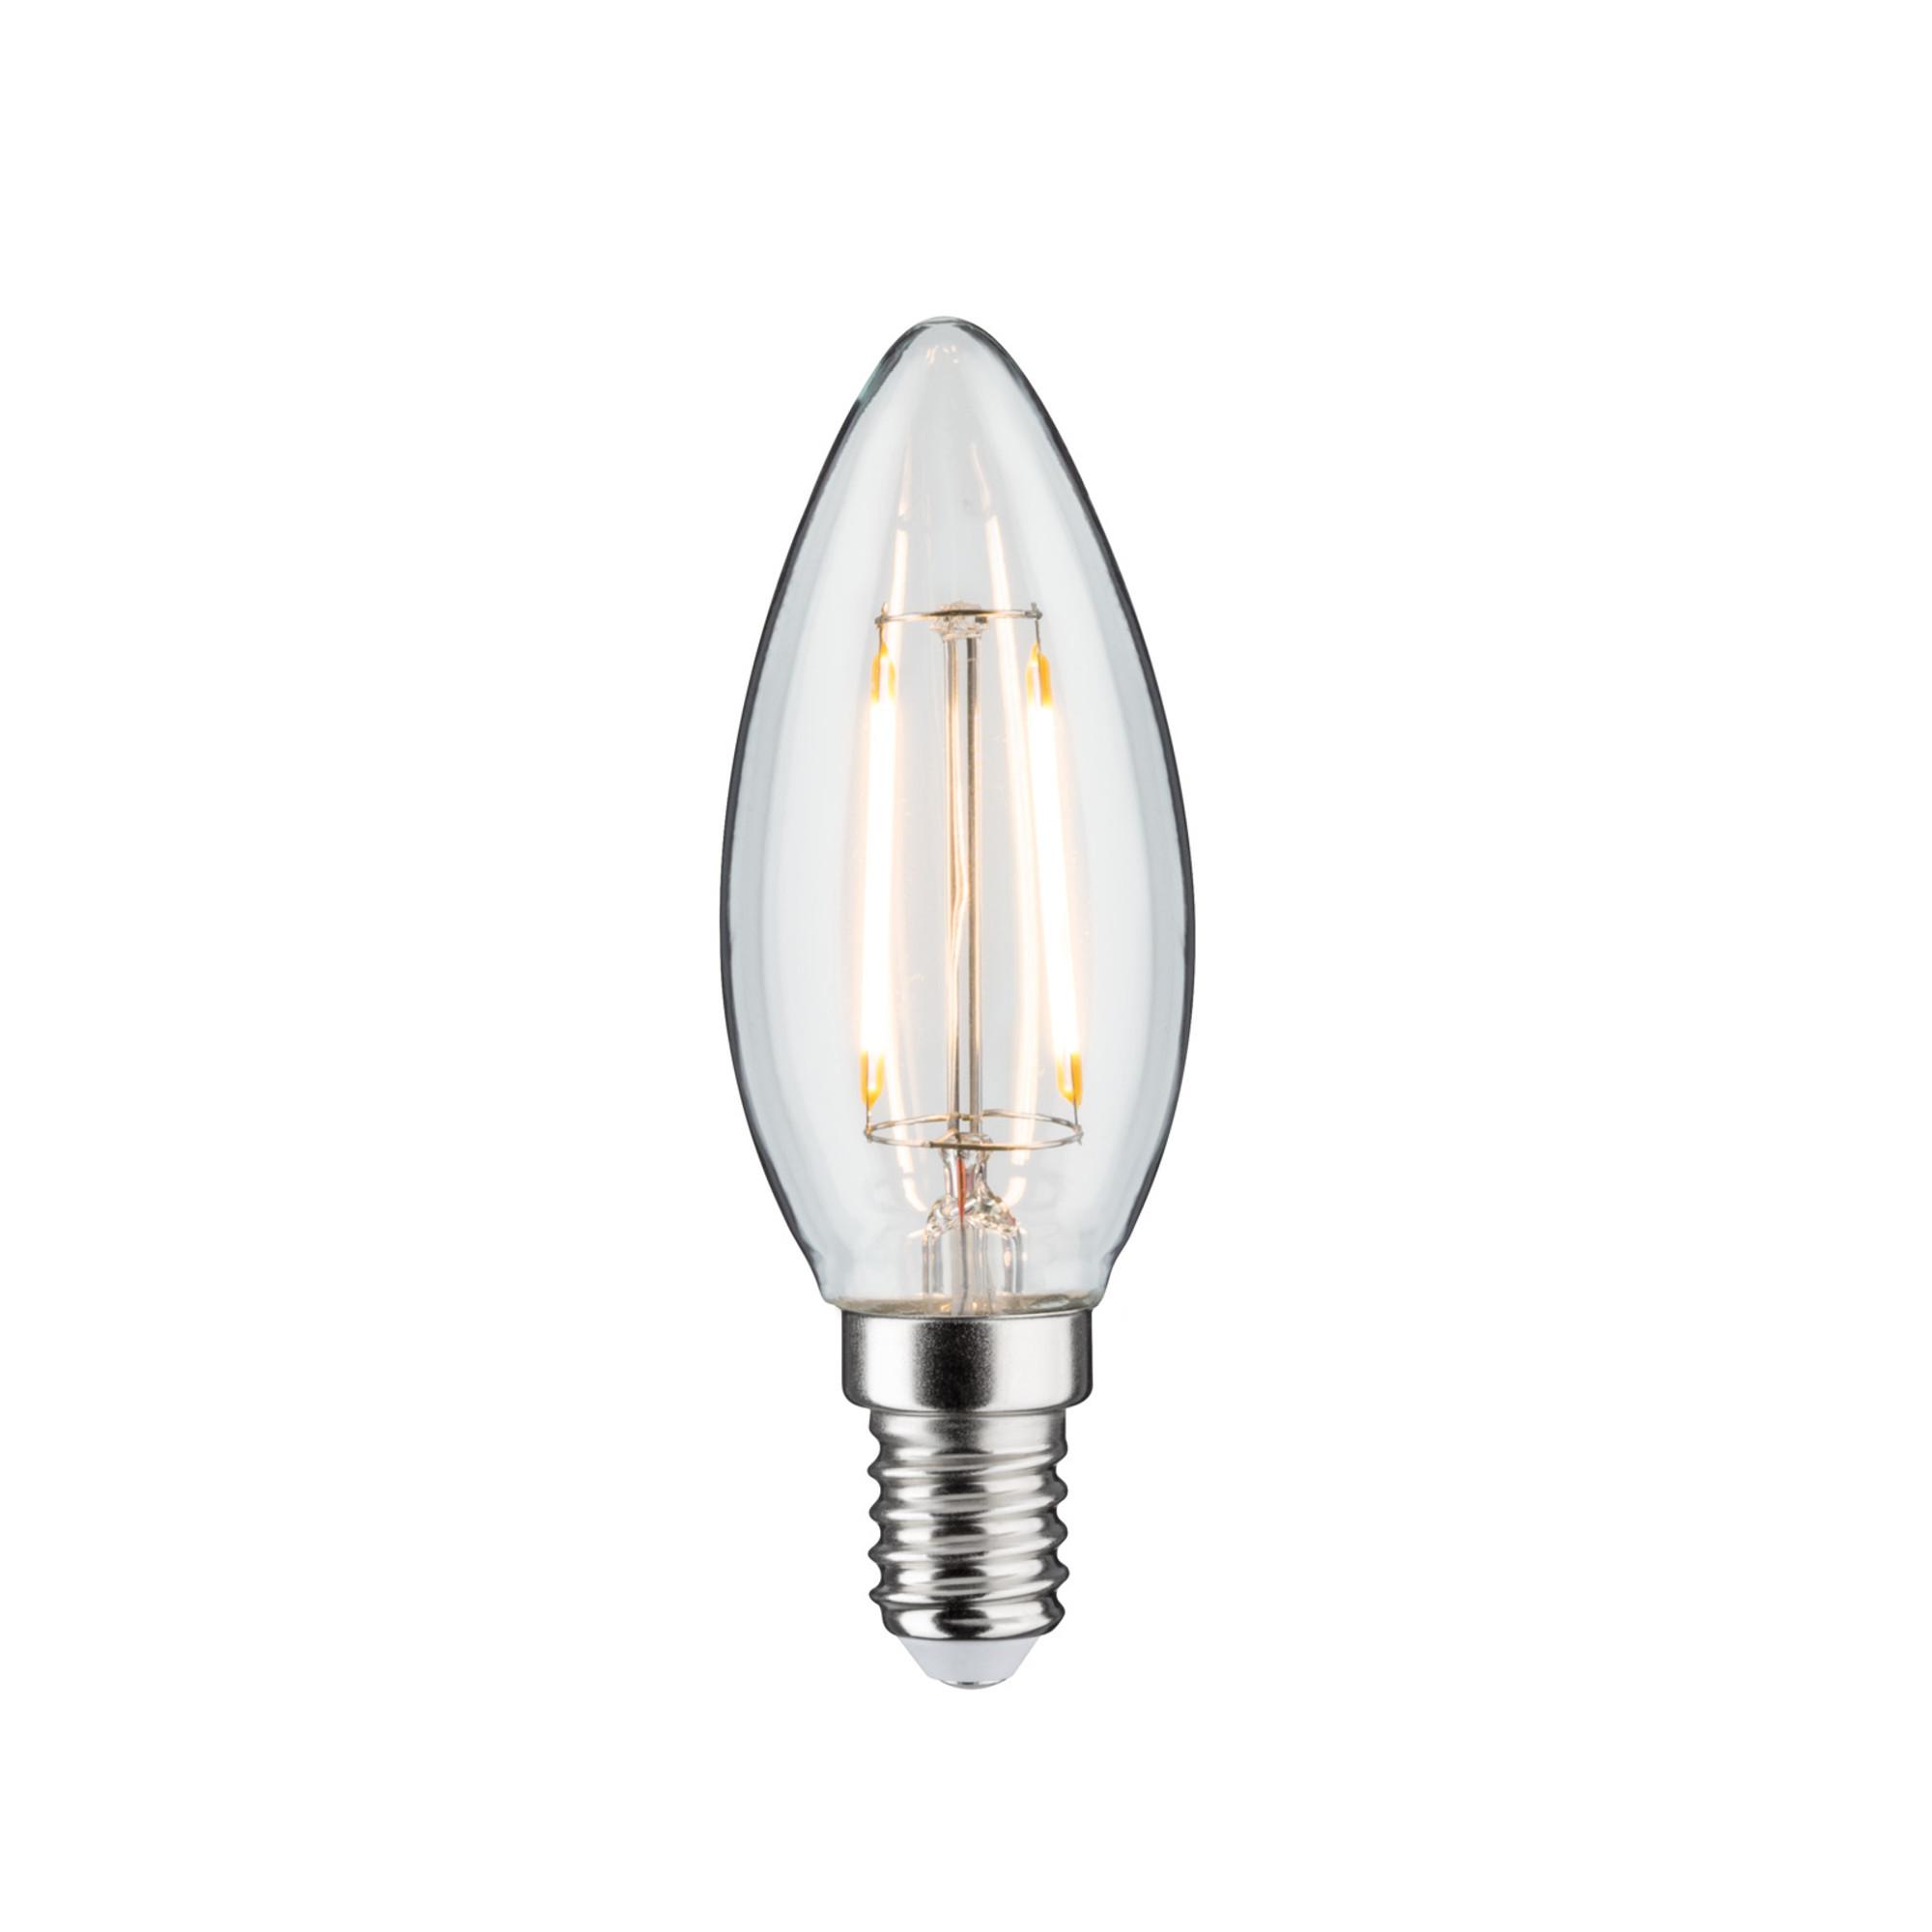 Светодиодная лампочка Paulmann 28363 E14 250 Лм 2.5 Вт